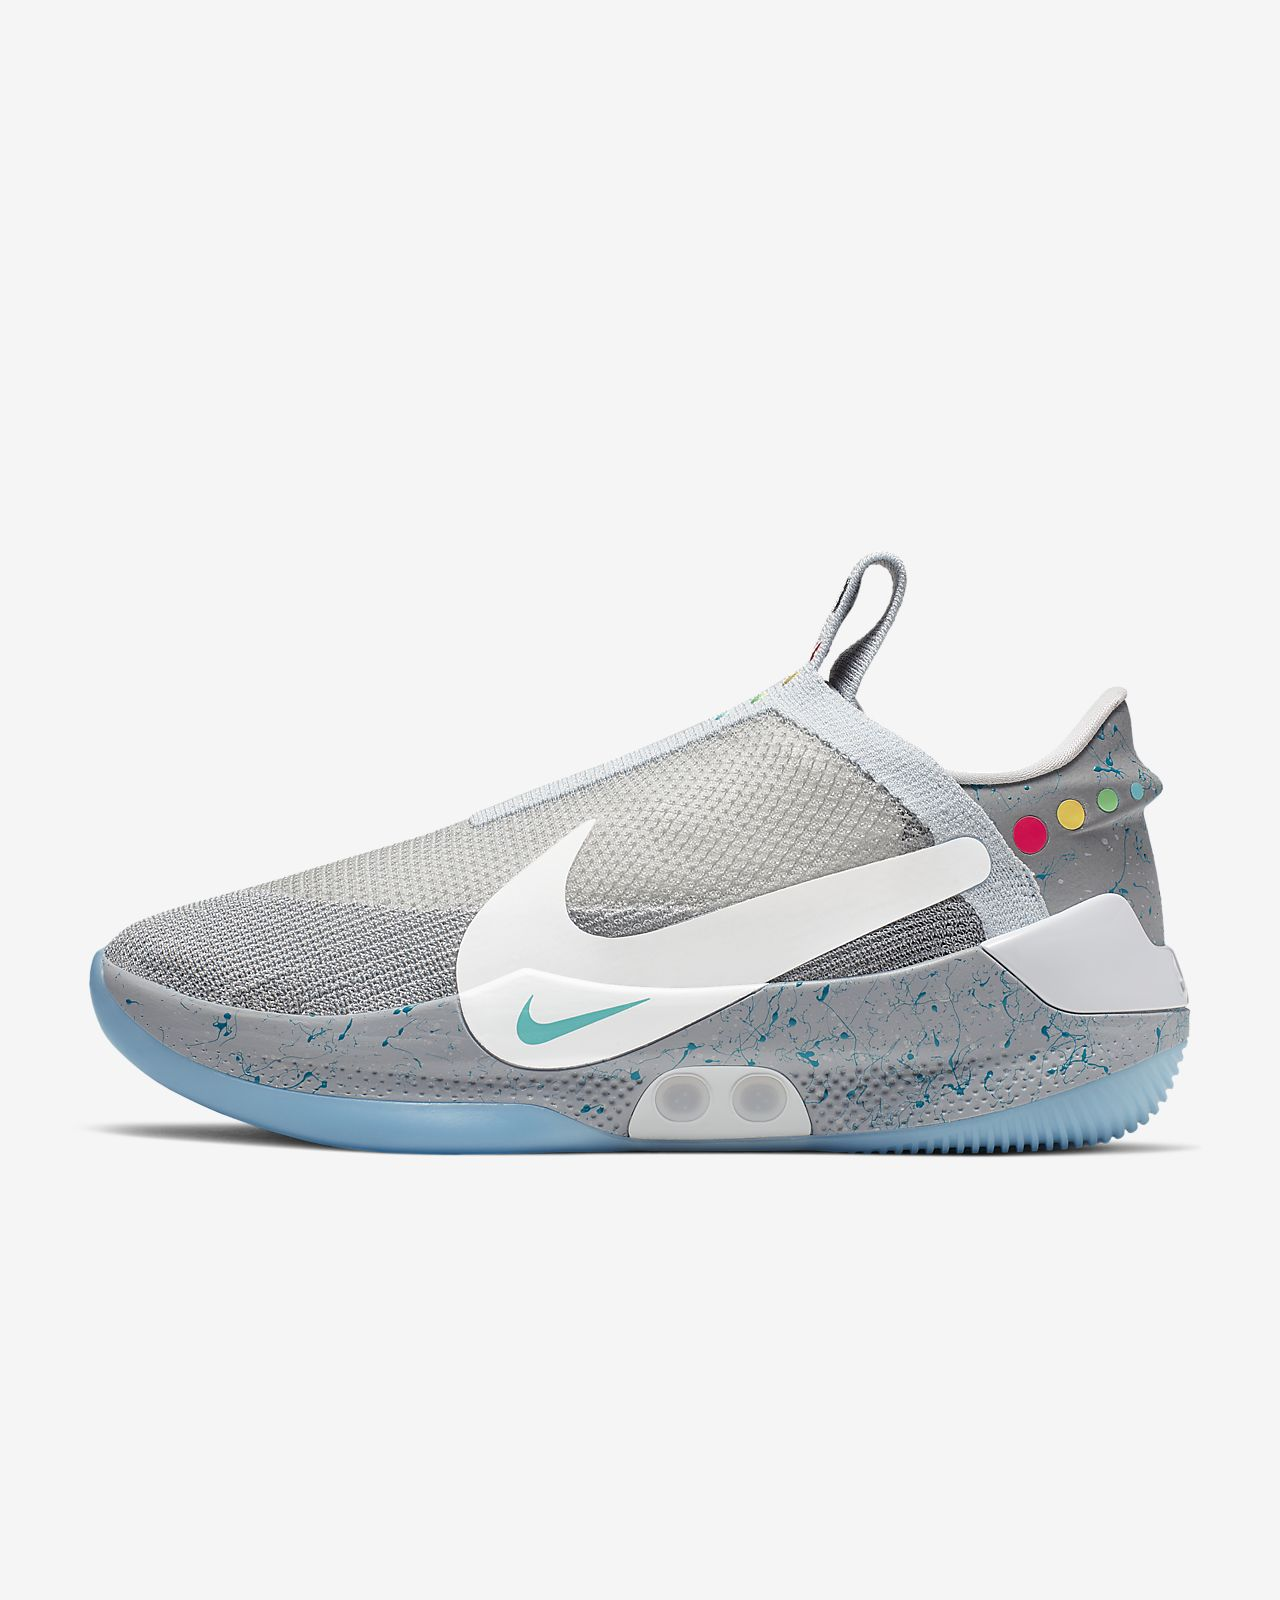 Chaussure de basketball Nike Adapt BB